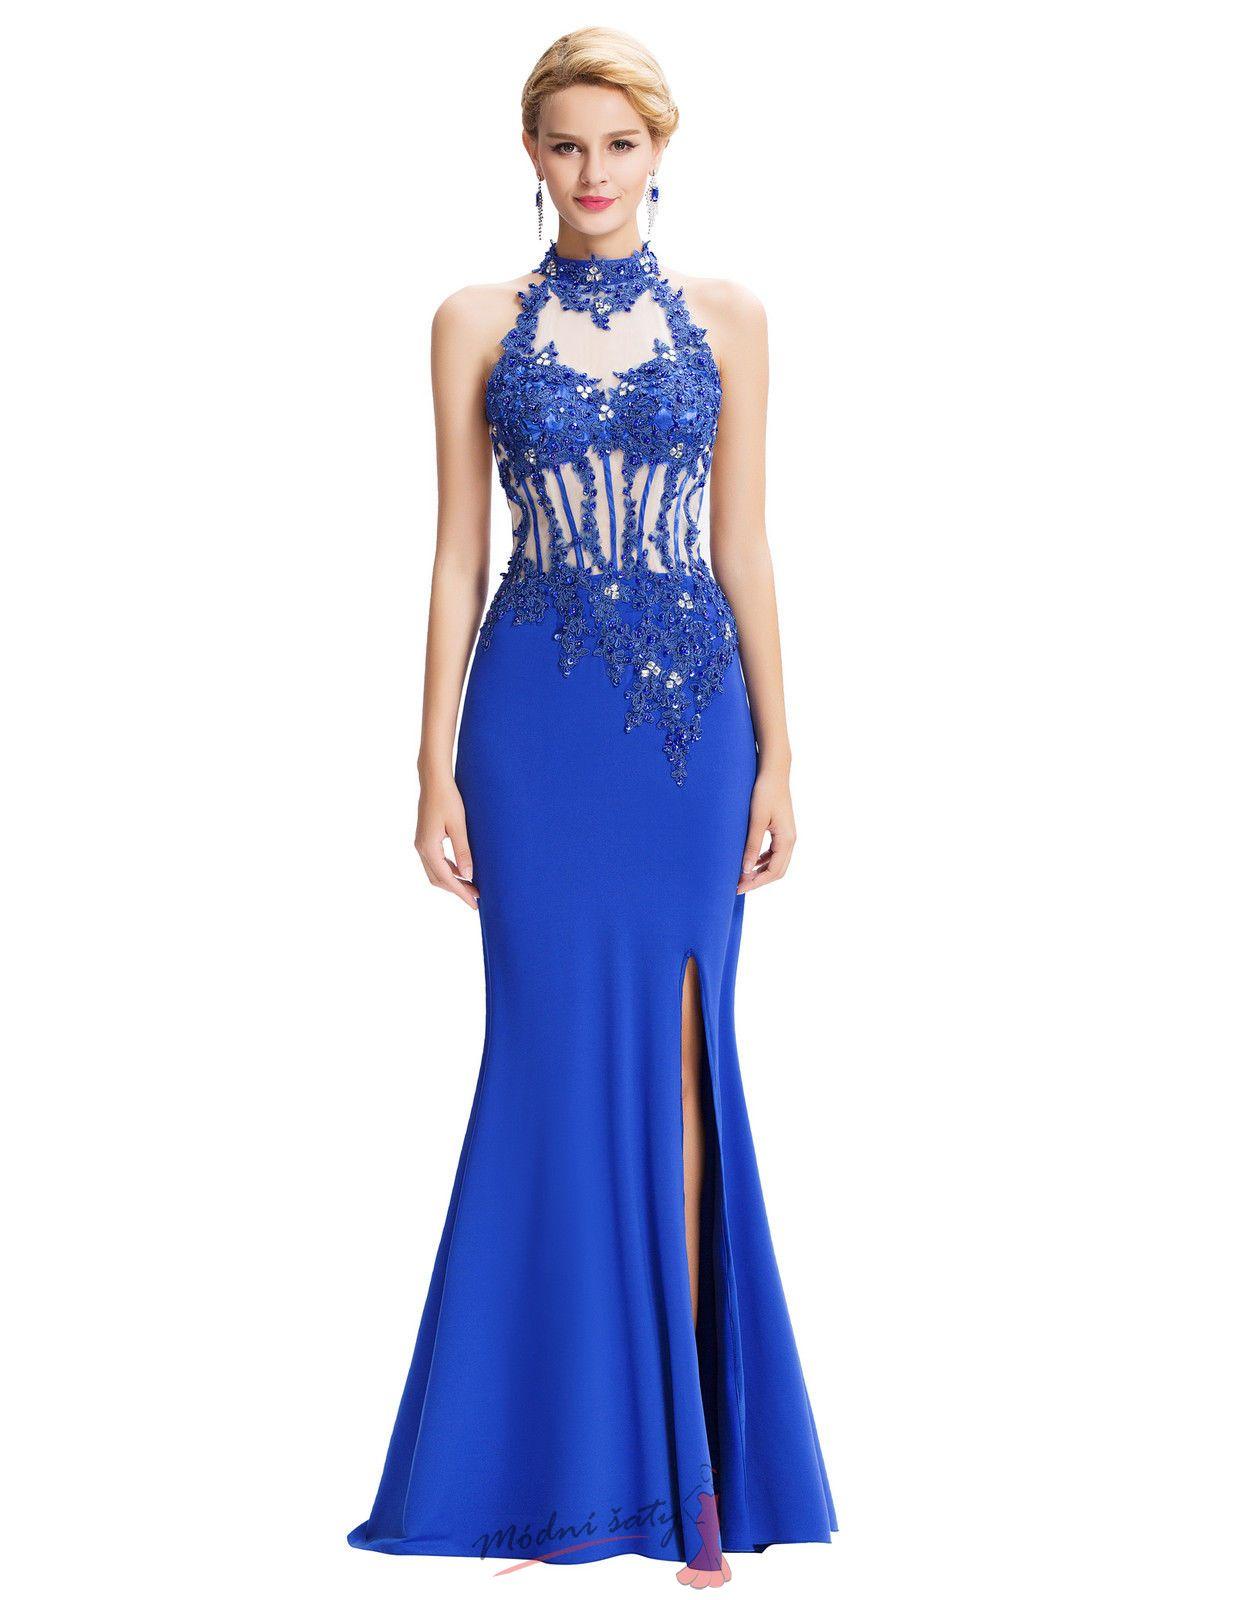 f4b8b16a5c3b Modré plesové šaty s rozparkem